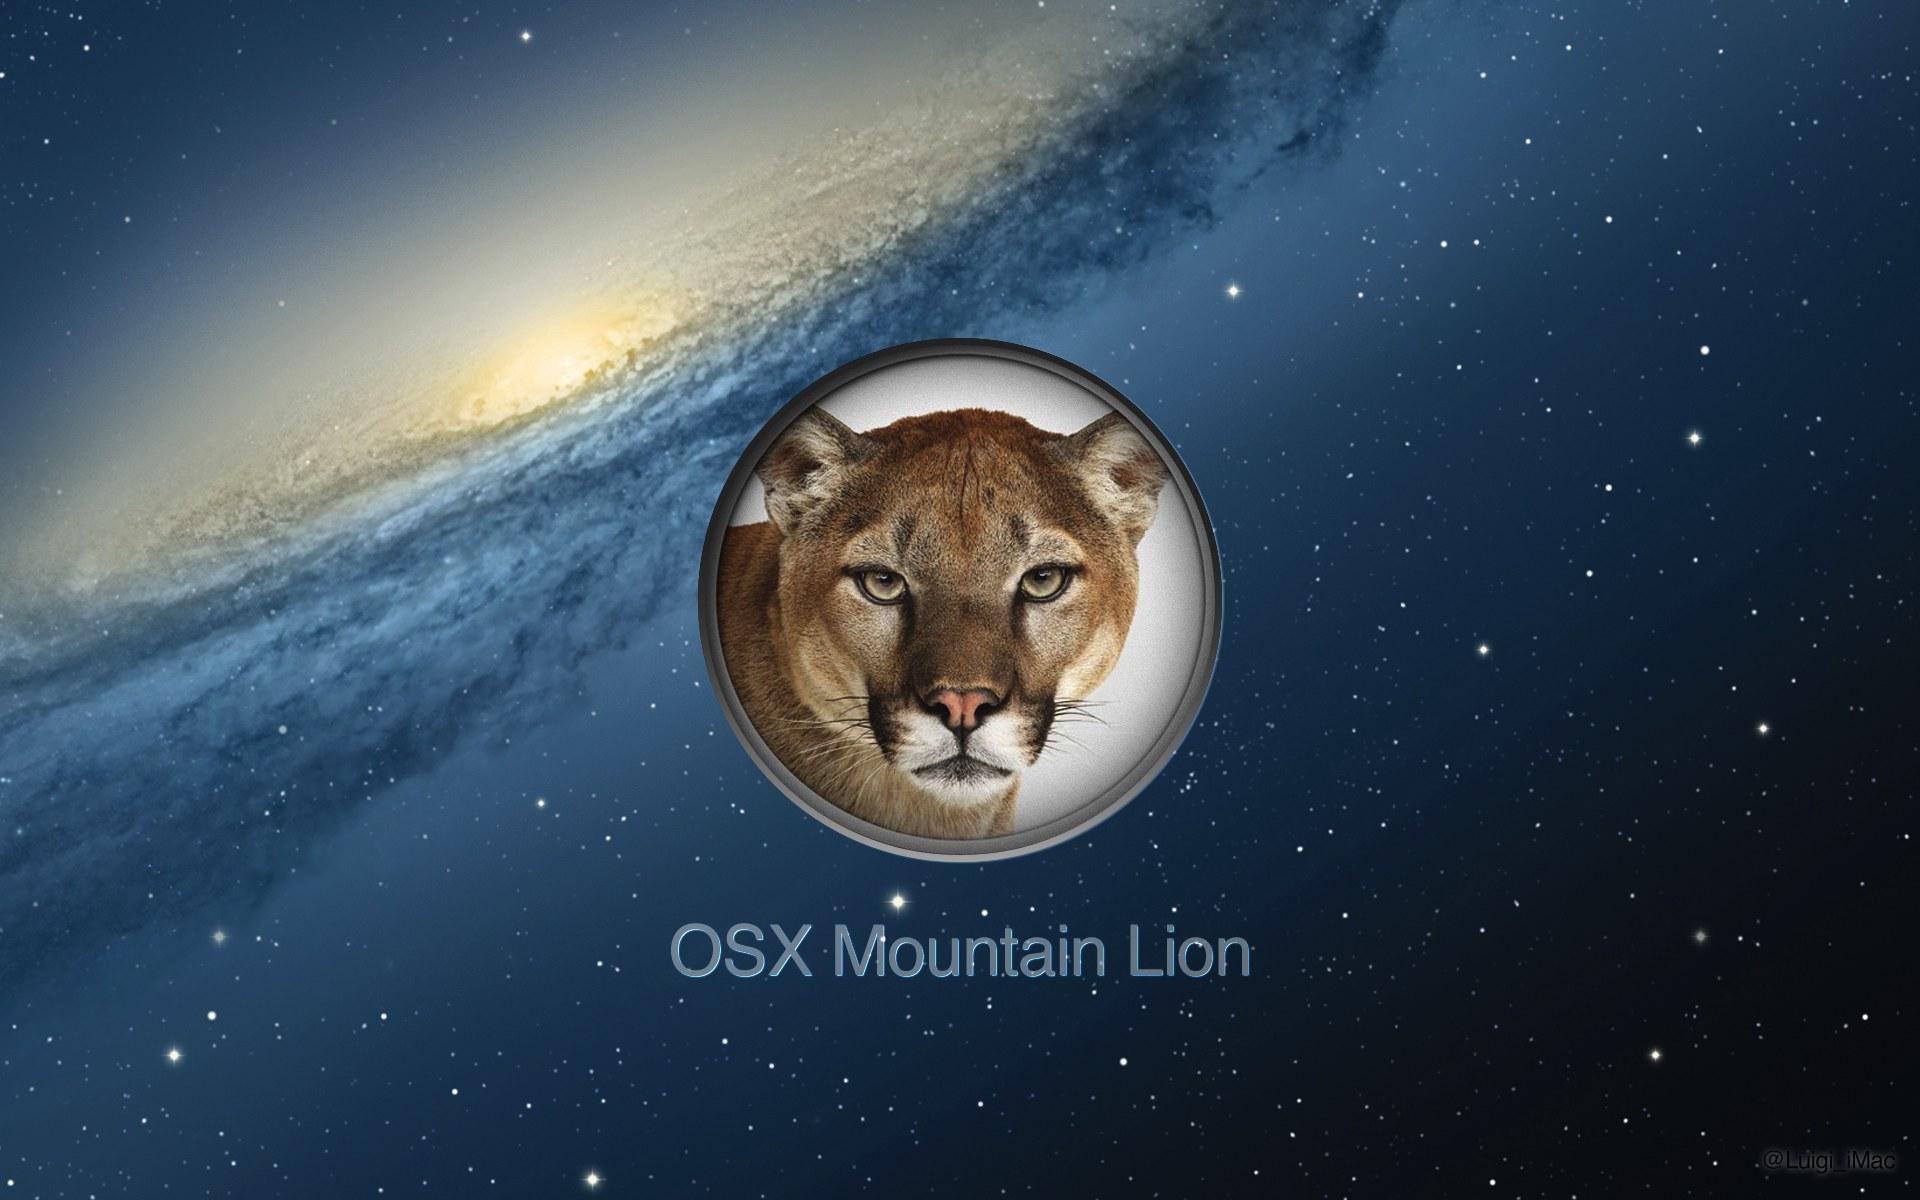 os x mountain lion to ship july 19